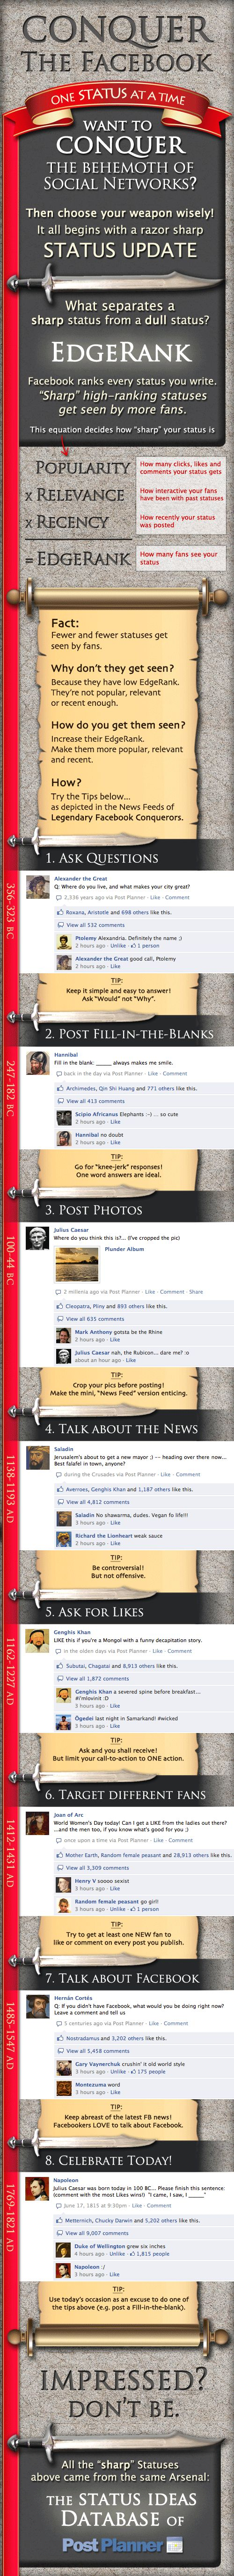 8 Facebook Status Ideas that will Improve your EdgeRank (Infographic)